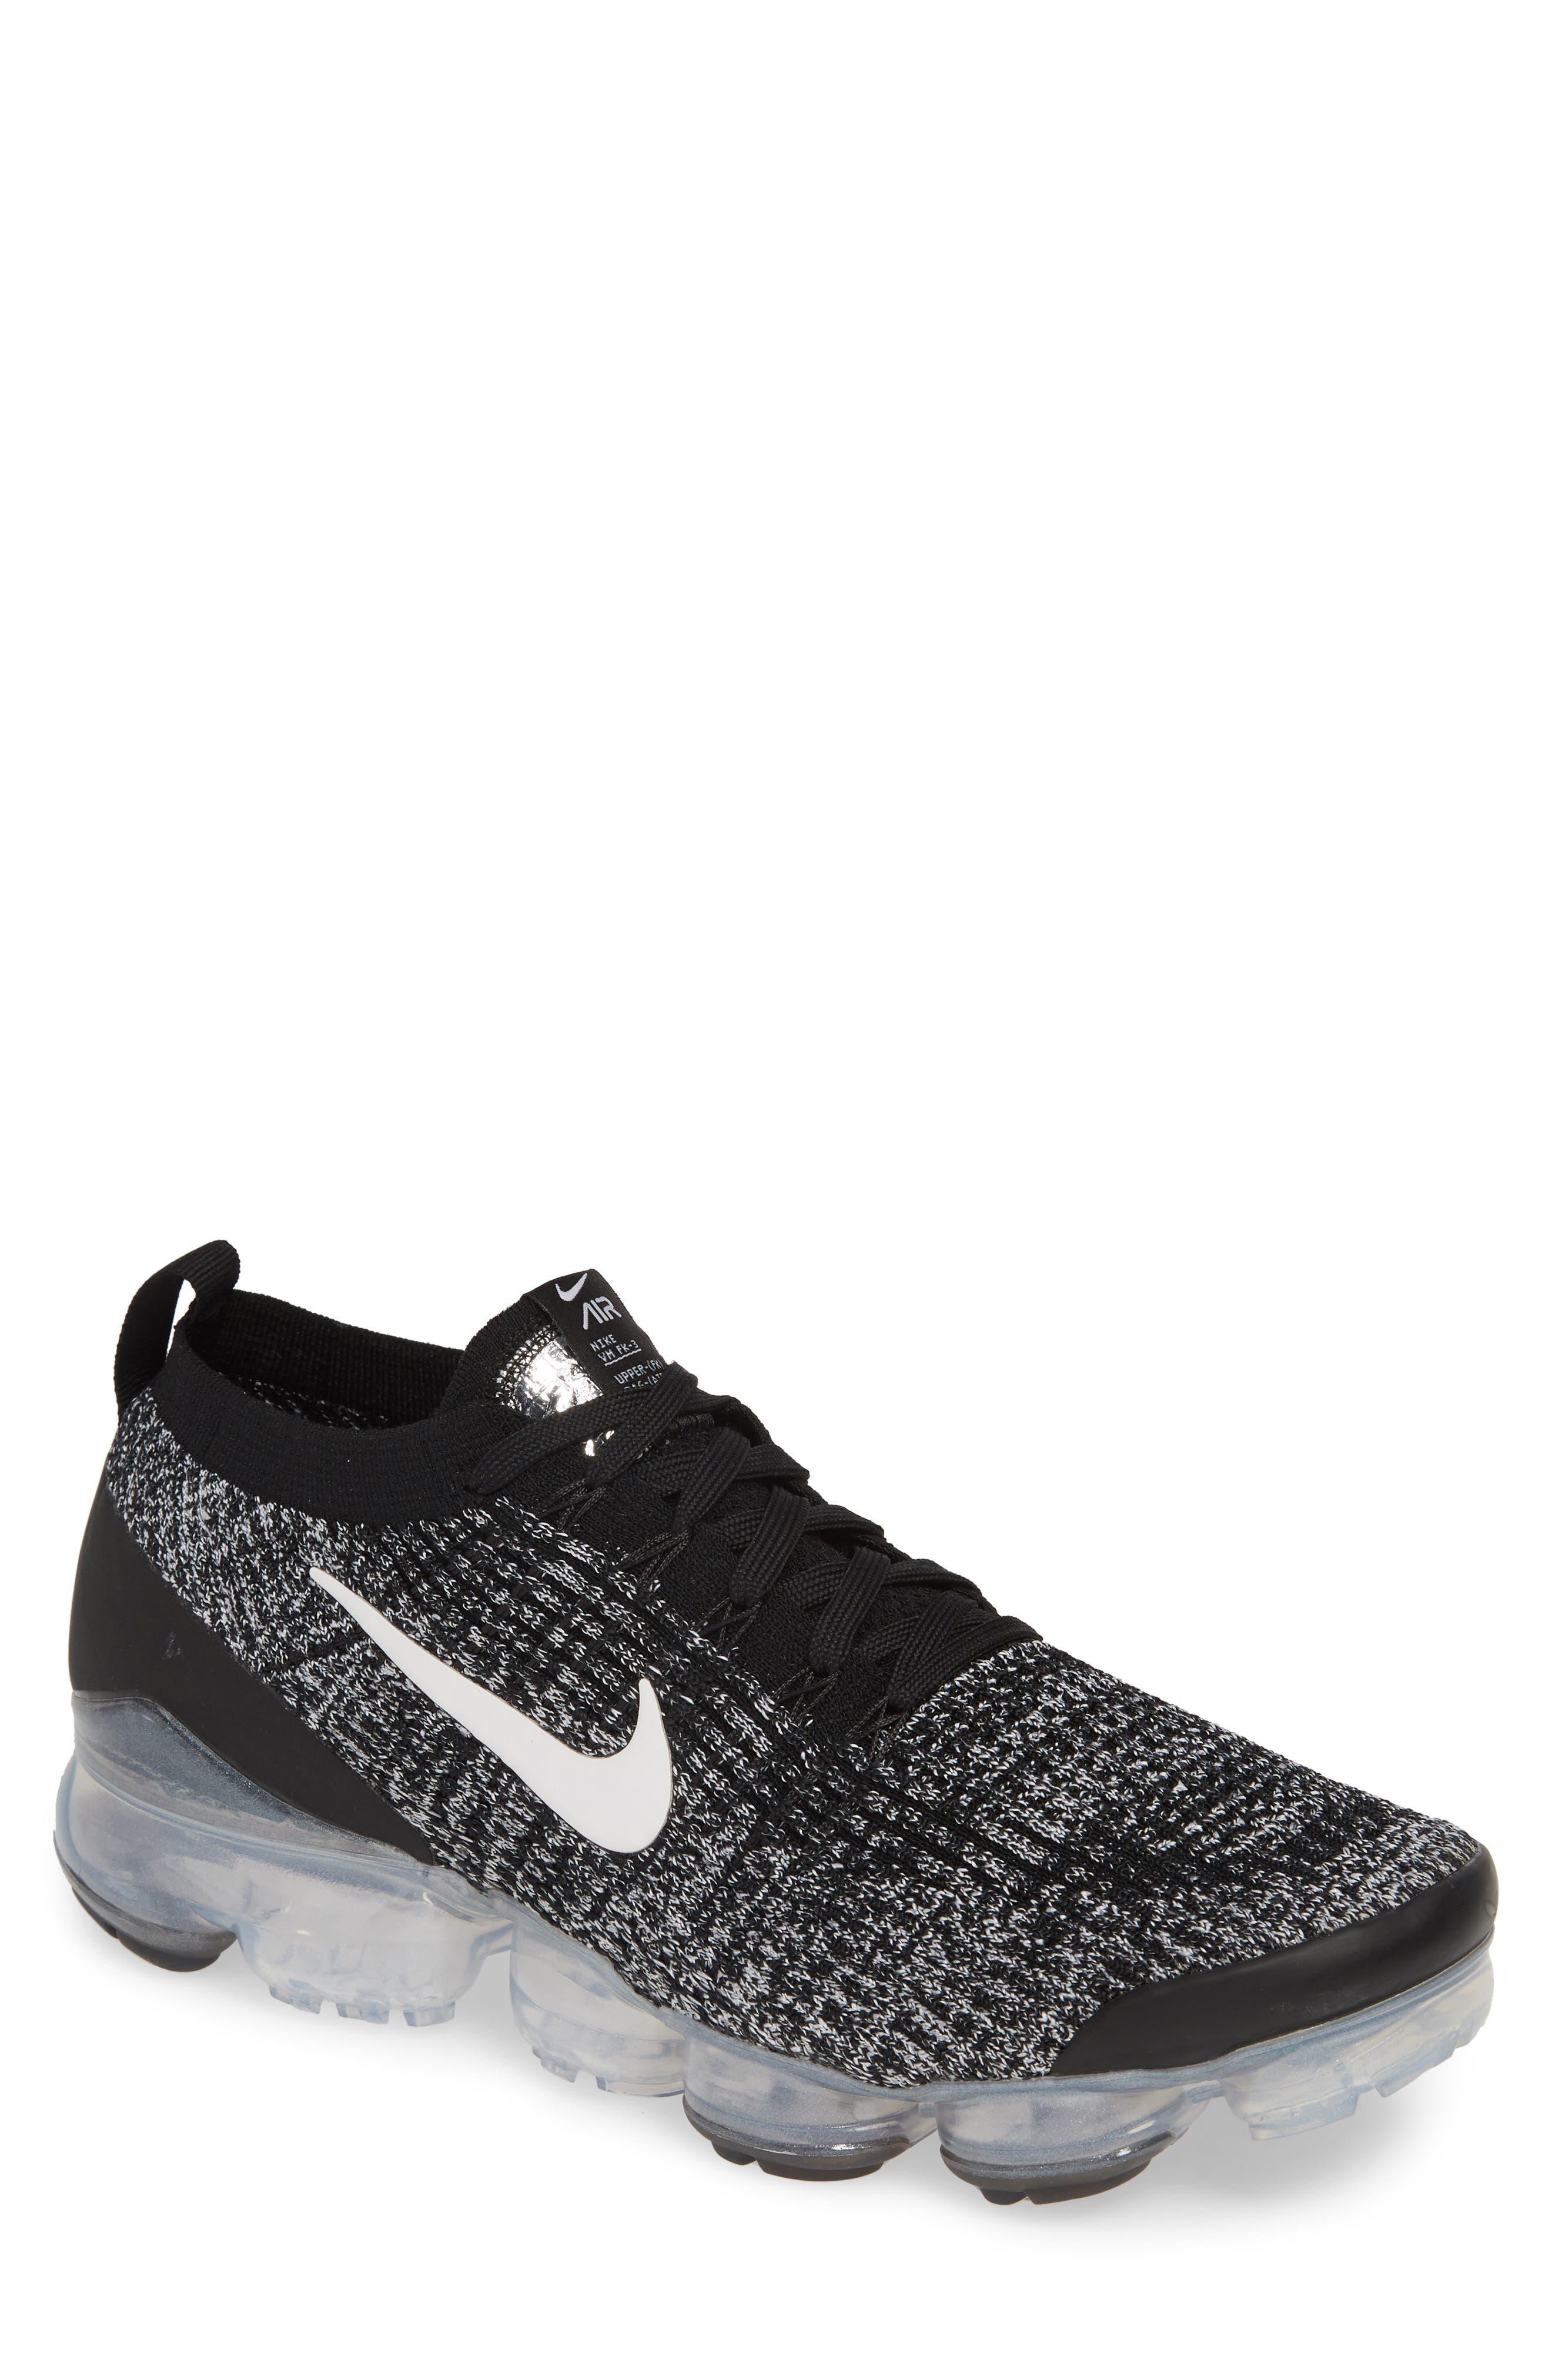 Air VaporMax Flyknit 3 Sneaker, Main, color, BLACK/ WHITE/ METALLIC SILVER